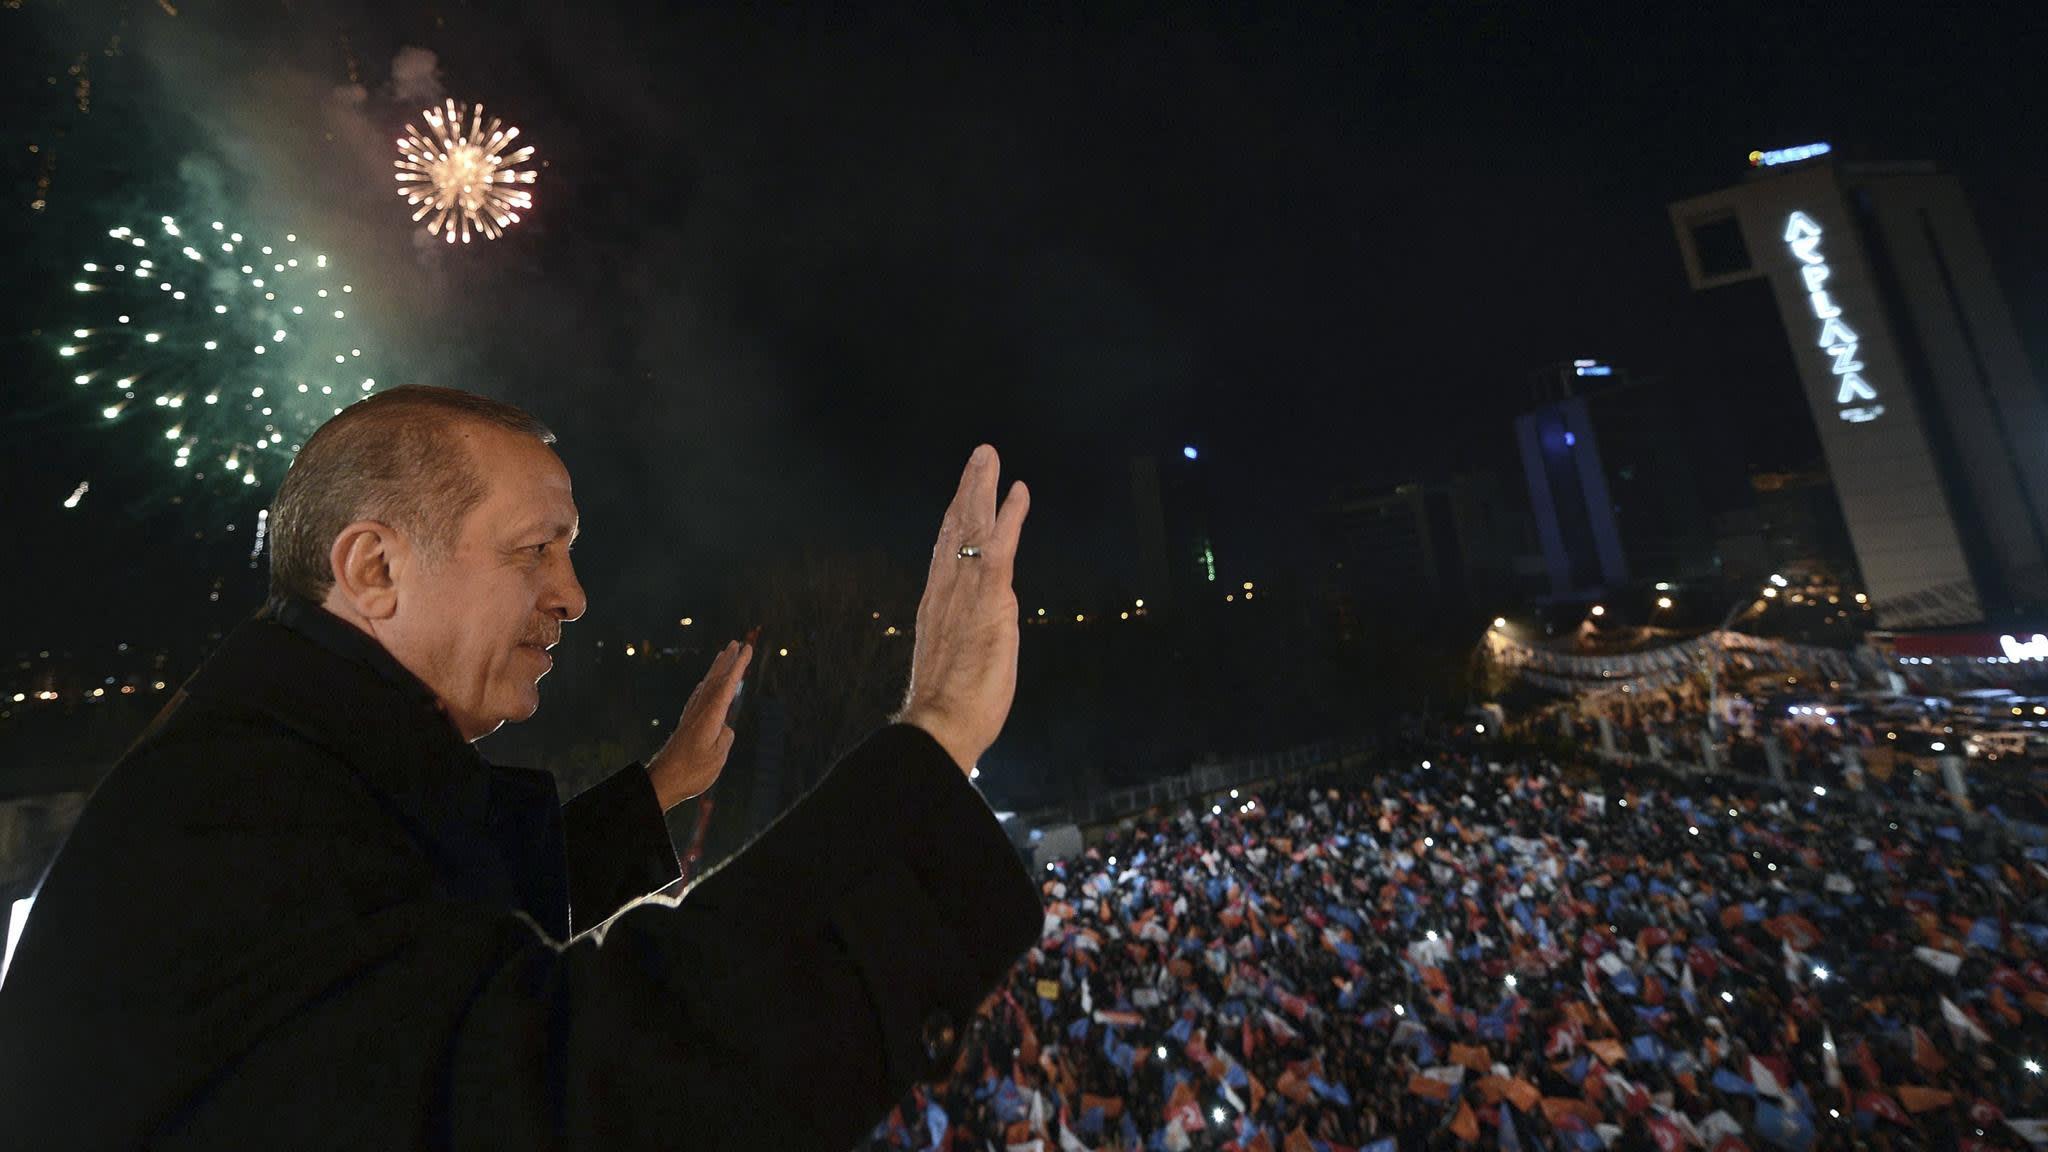 Recep Tayyip Erdogan claims victory in Turkey national polls   Financial Times